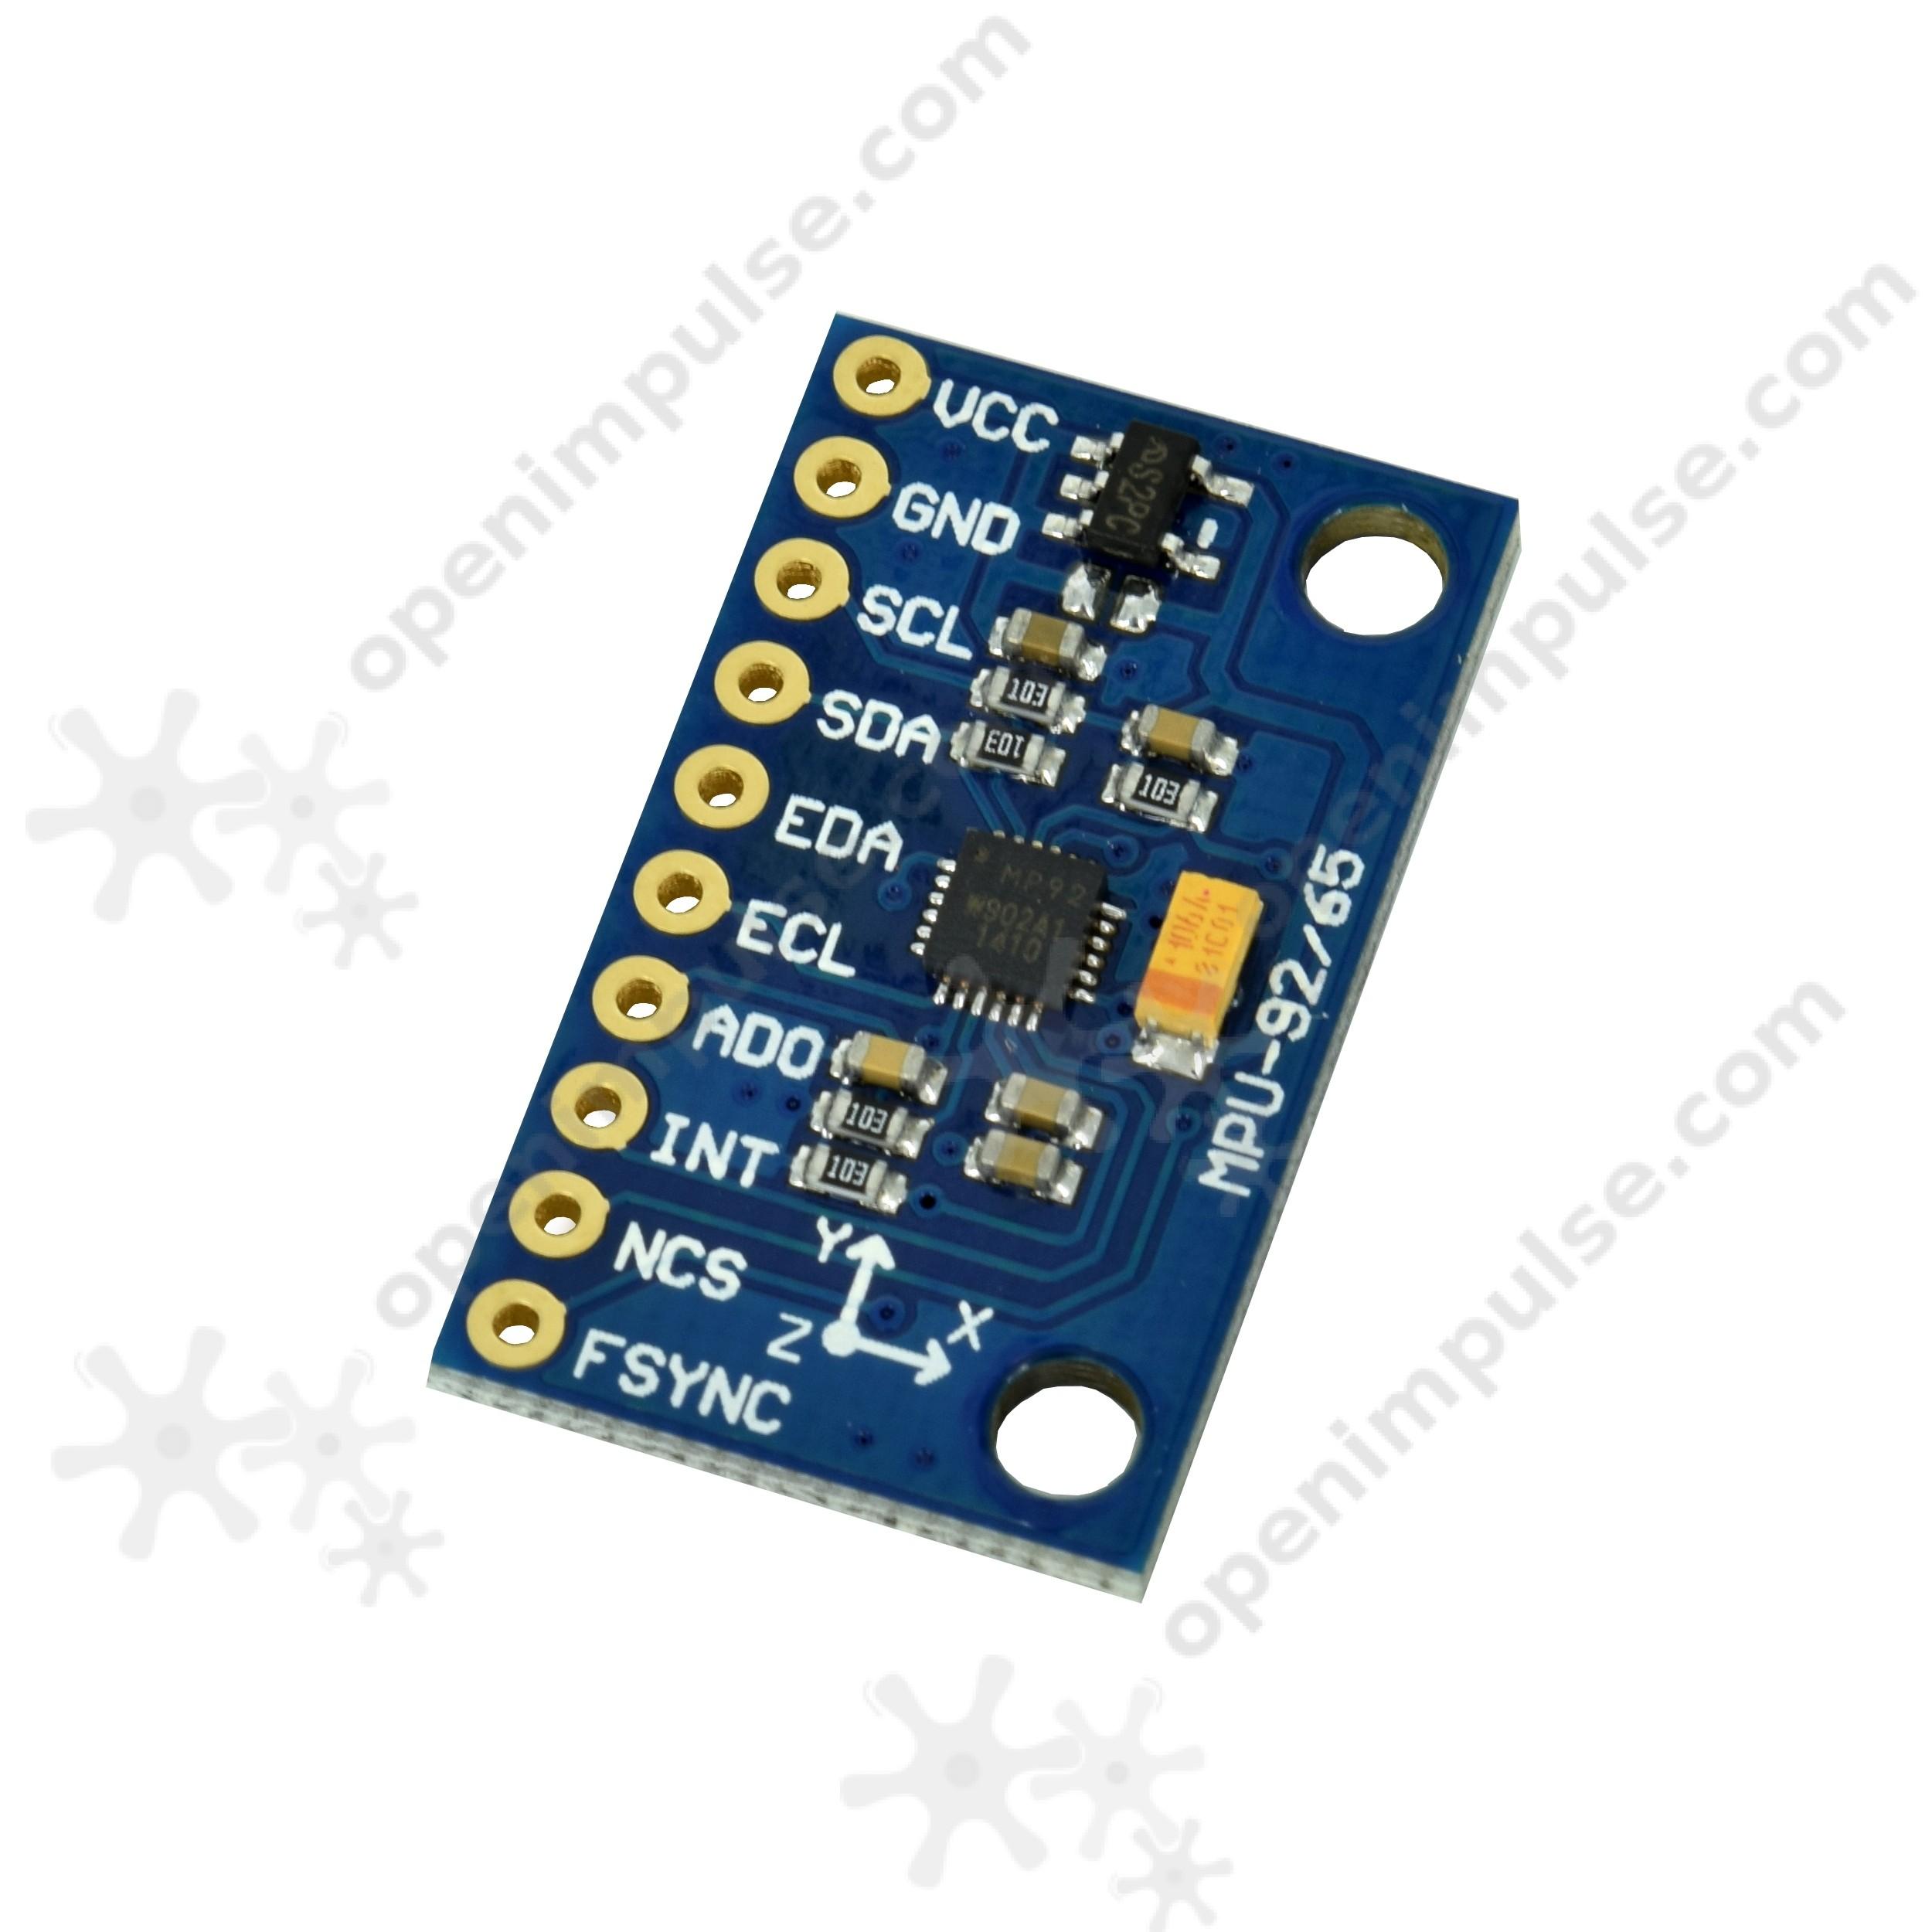 MPU9255 9DOF Digital Accelerometer, Giroscope and